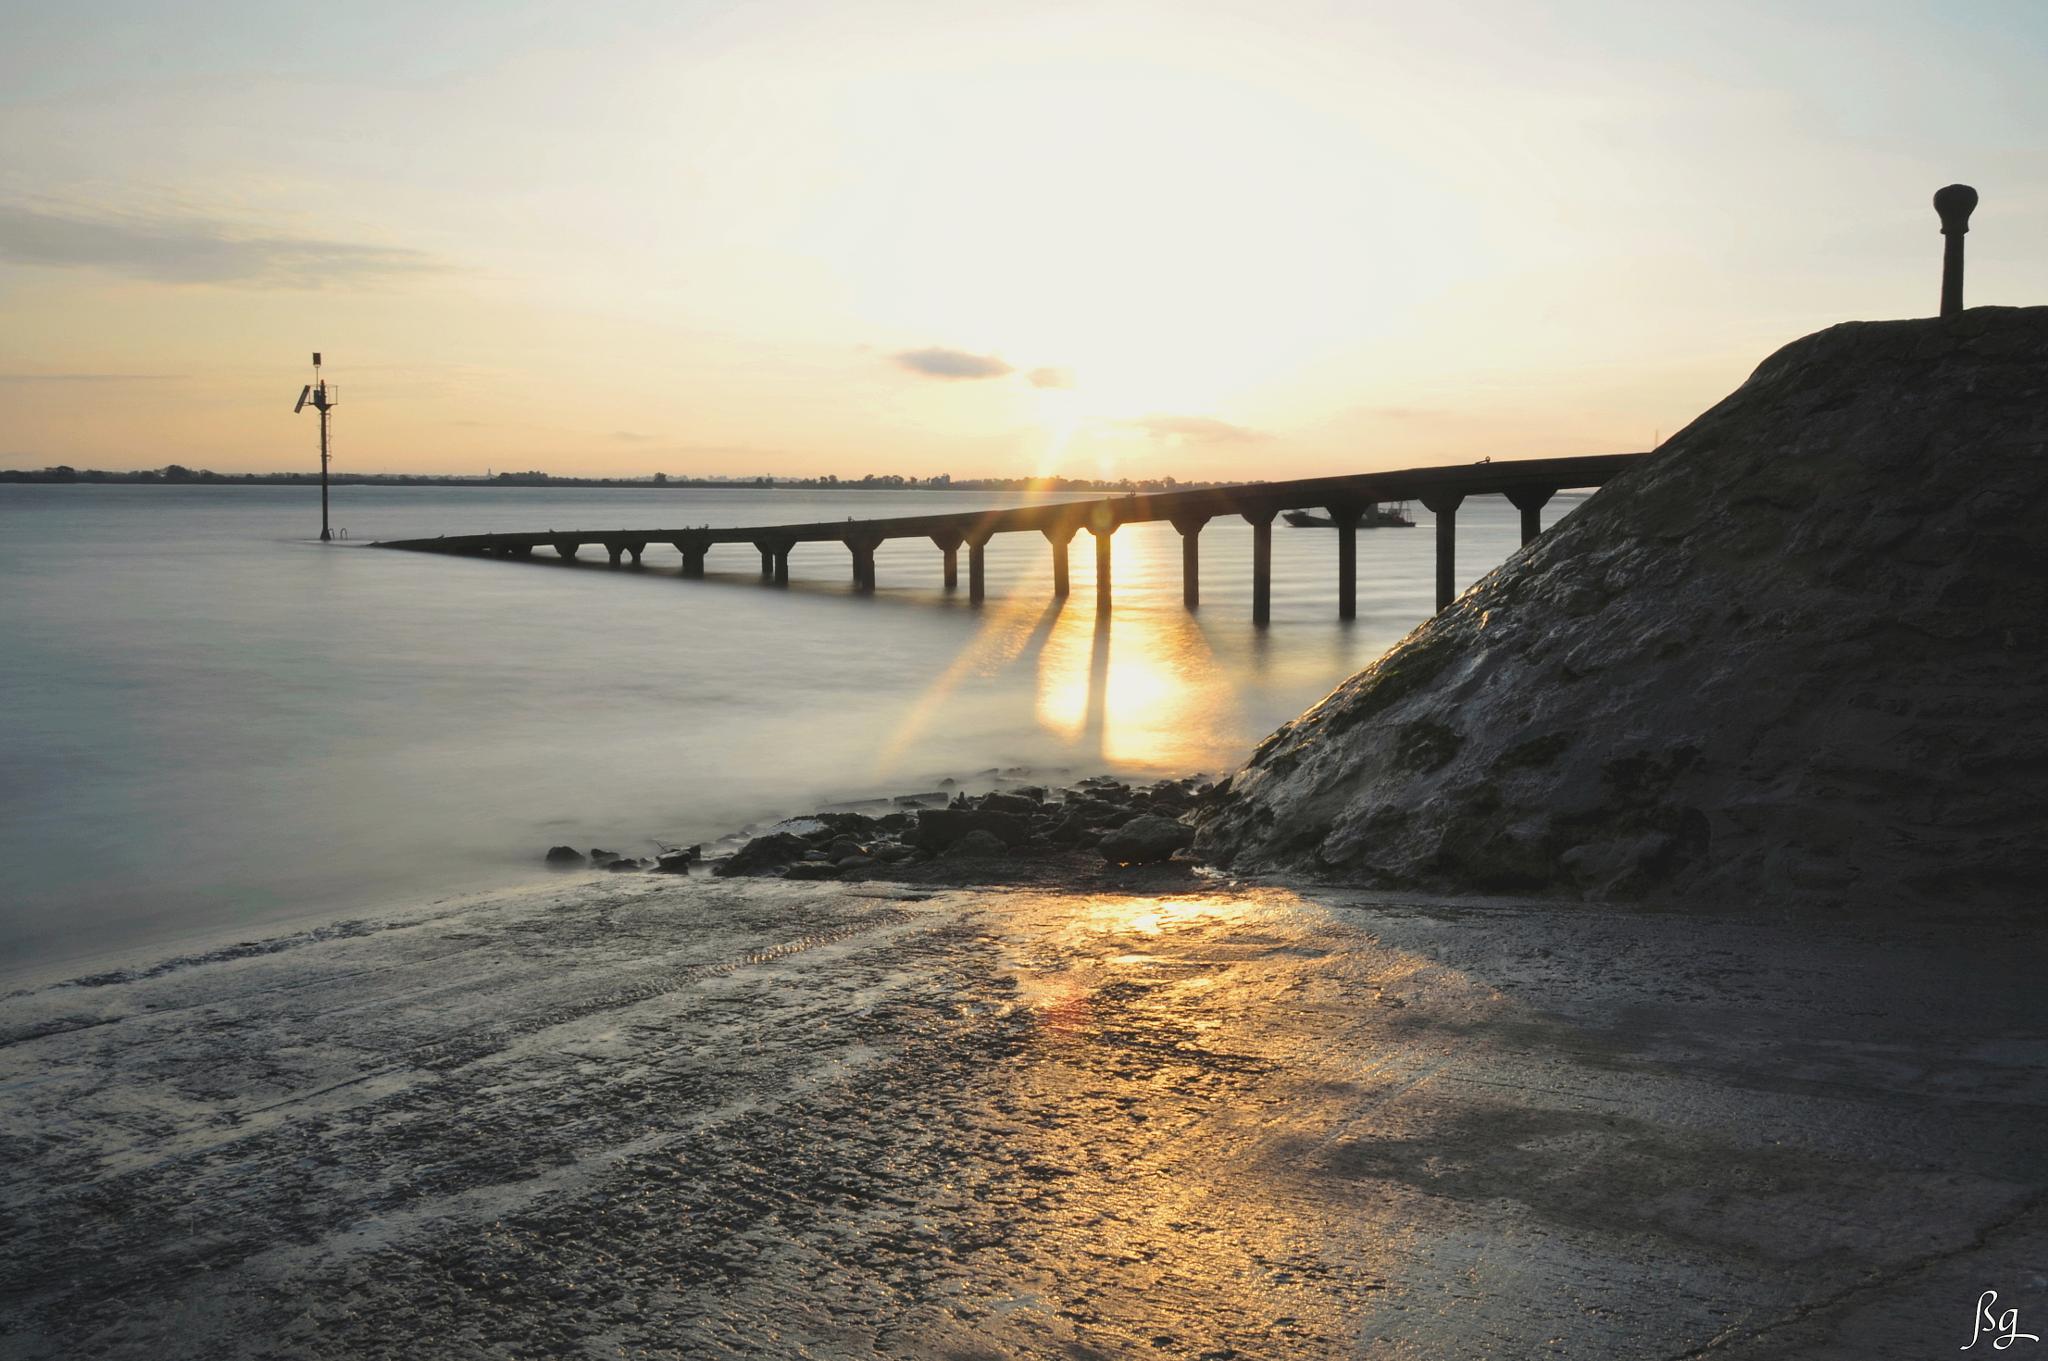 Low tide on the estuary by Bernard Guillon